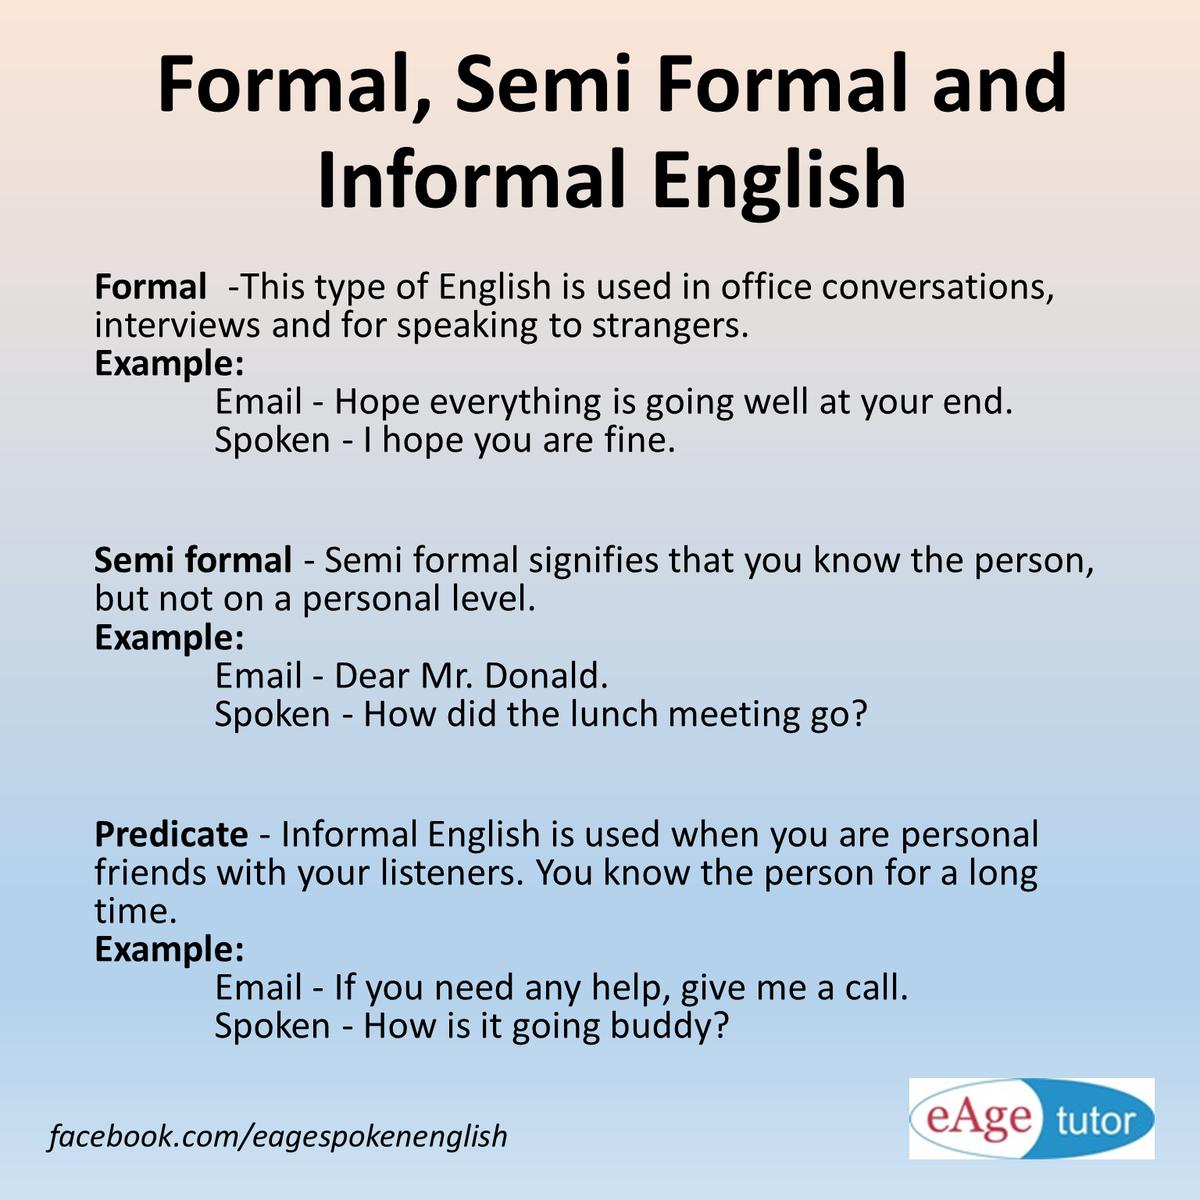 eAge Spoken English on Twitter: